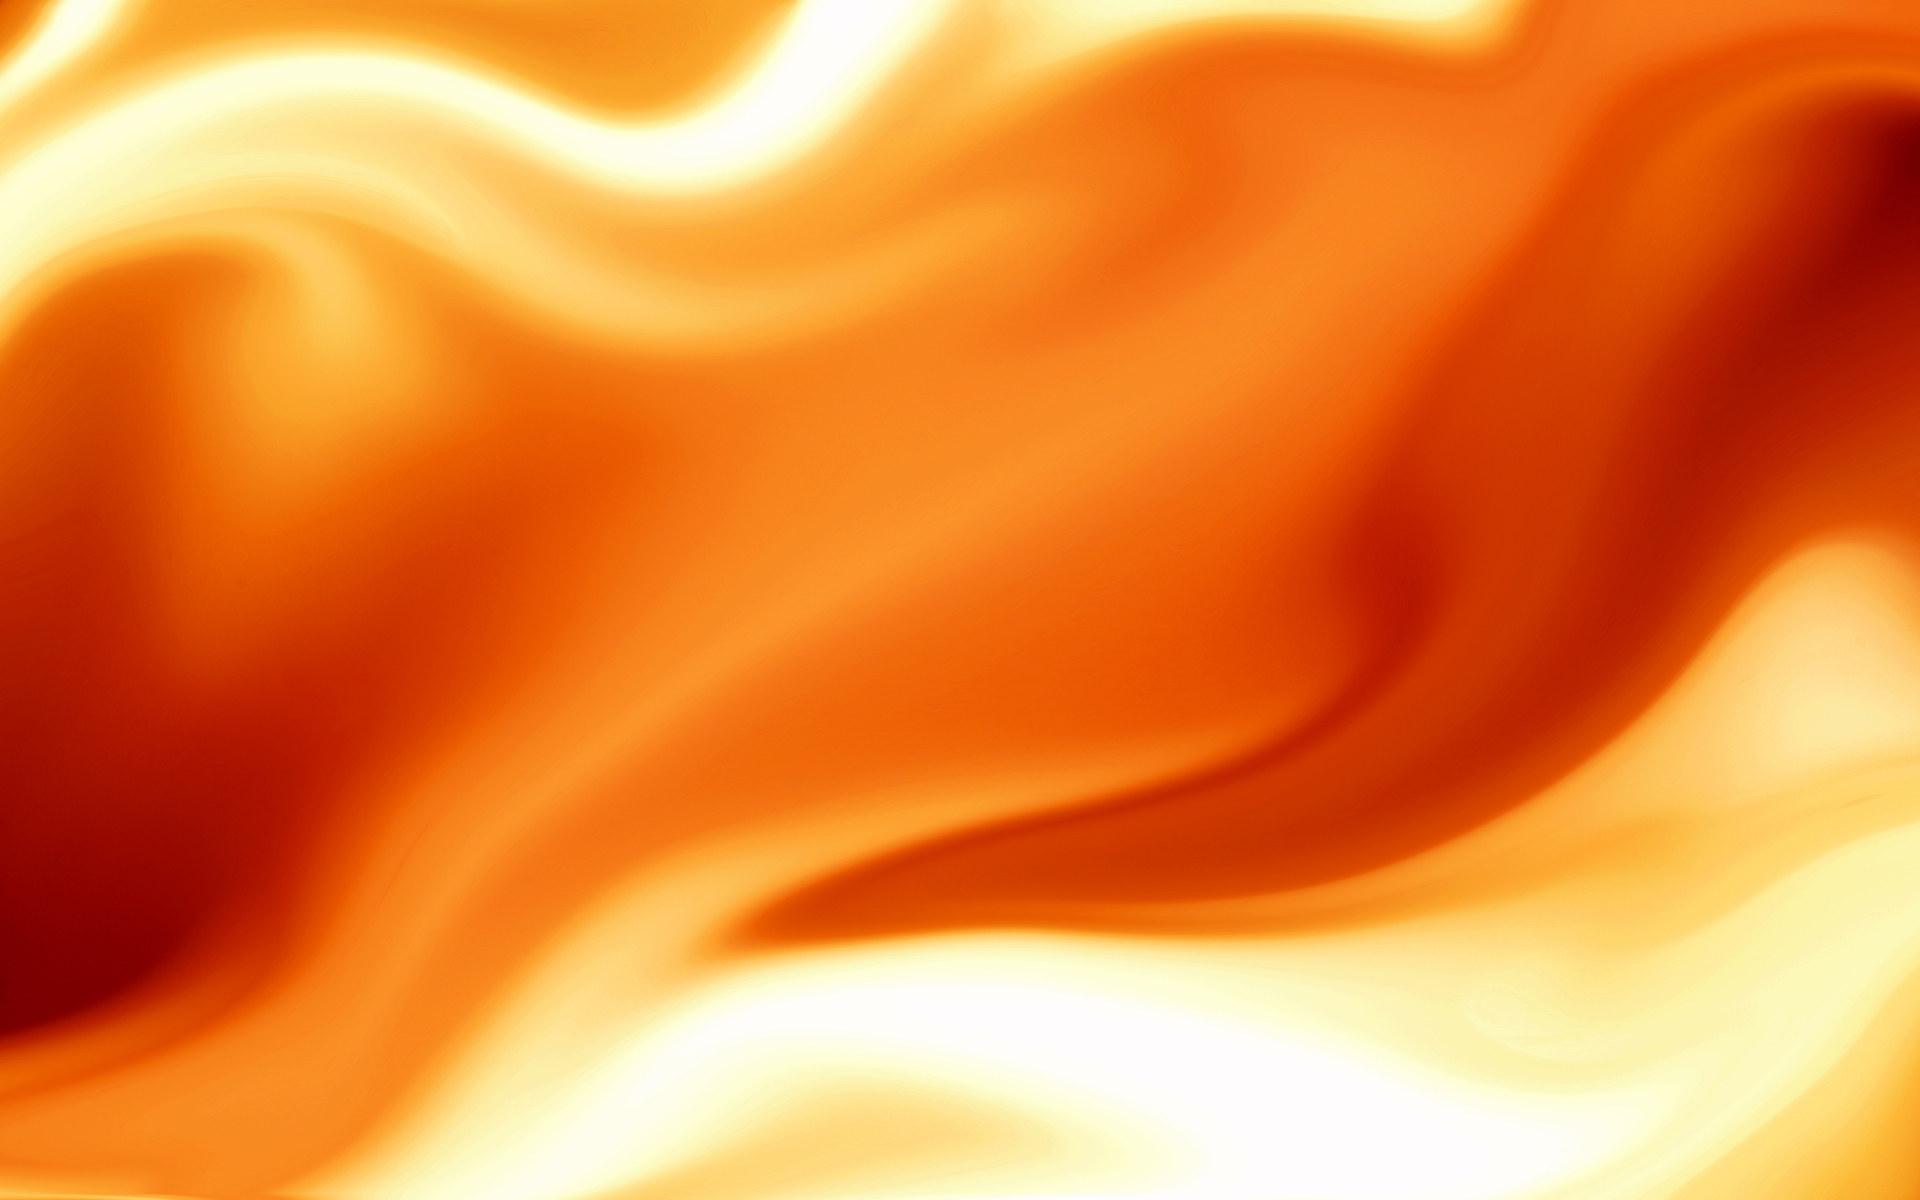 orange abstract 27670